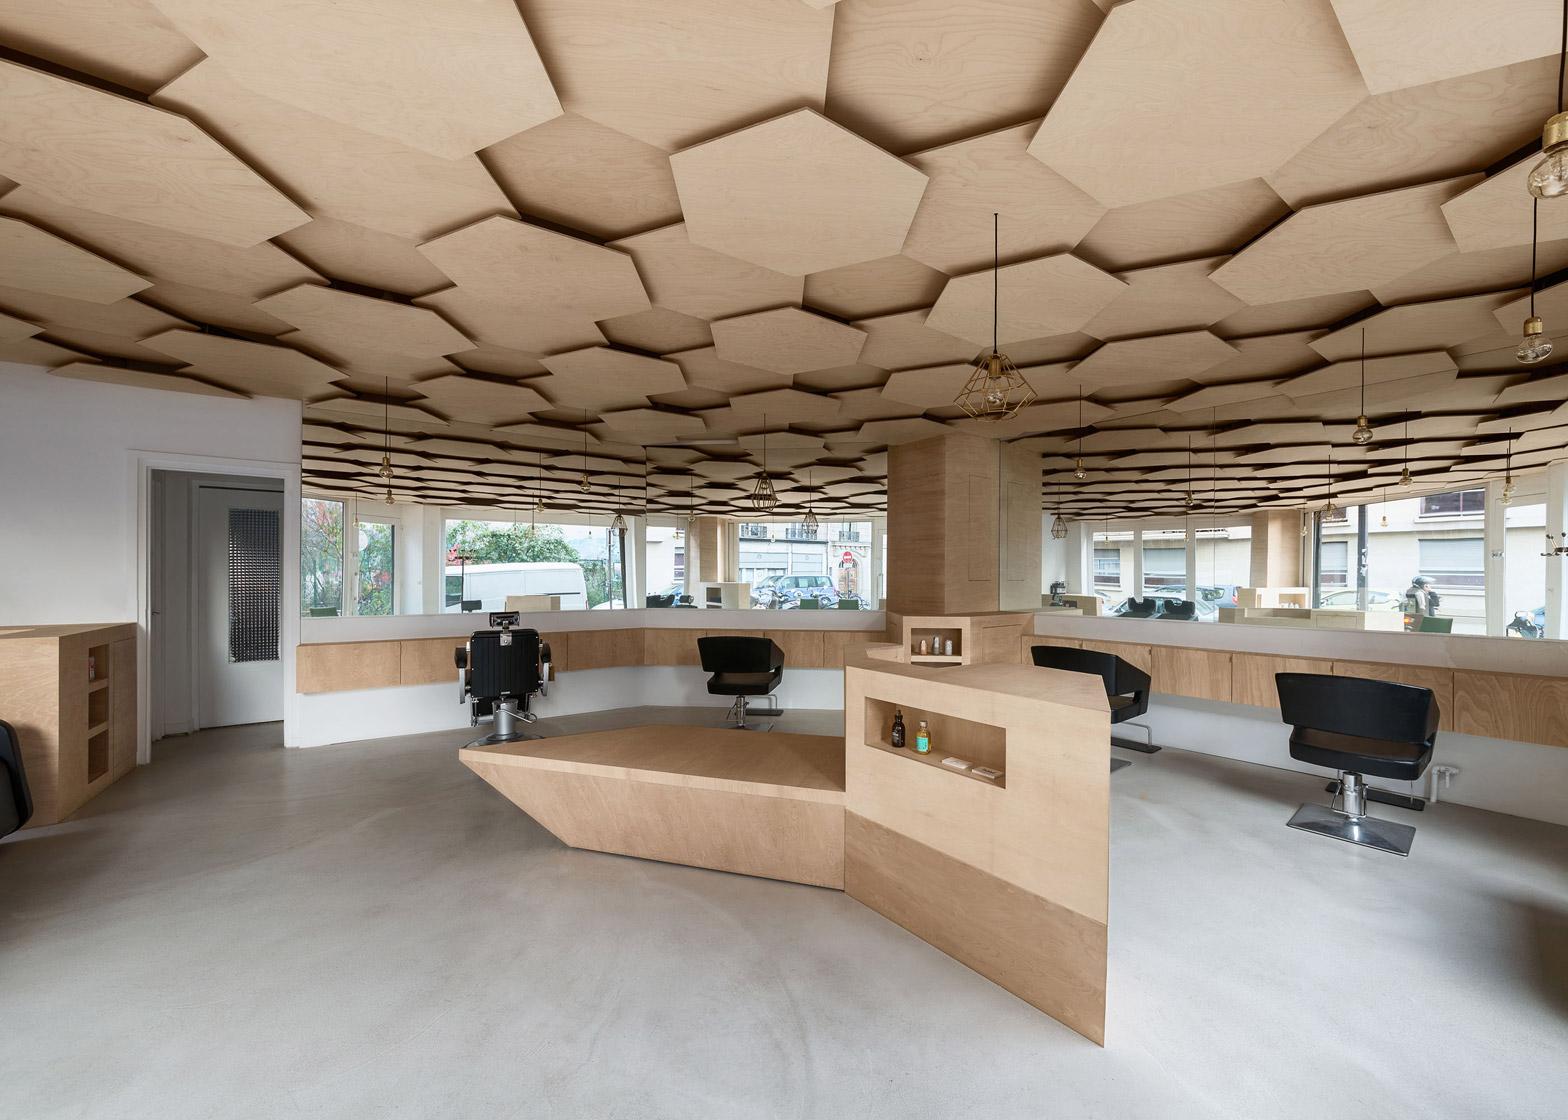 architecture_barber_shop_design_studia_interiors_osnovadesign_osnova_poltava_02